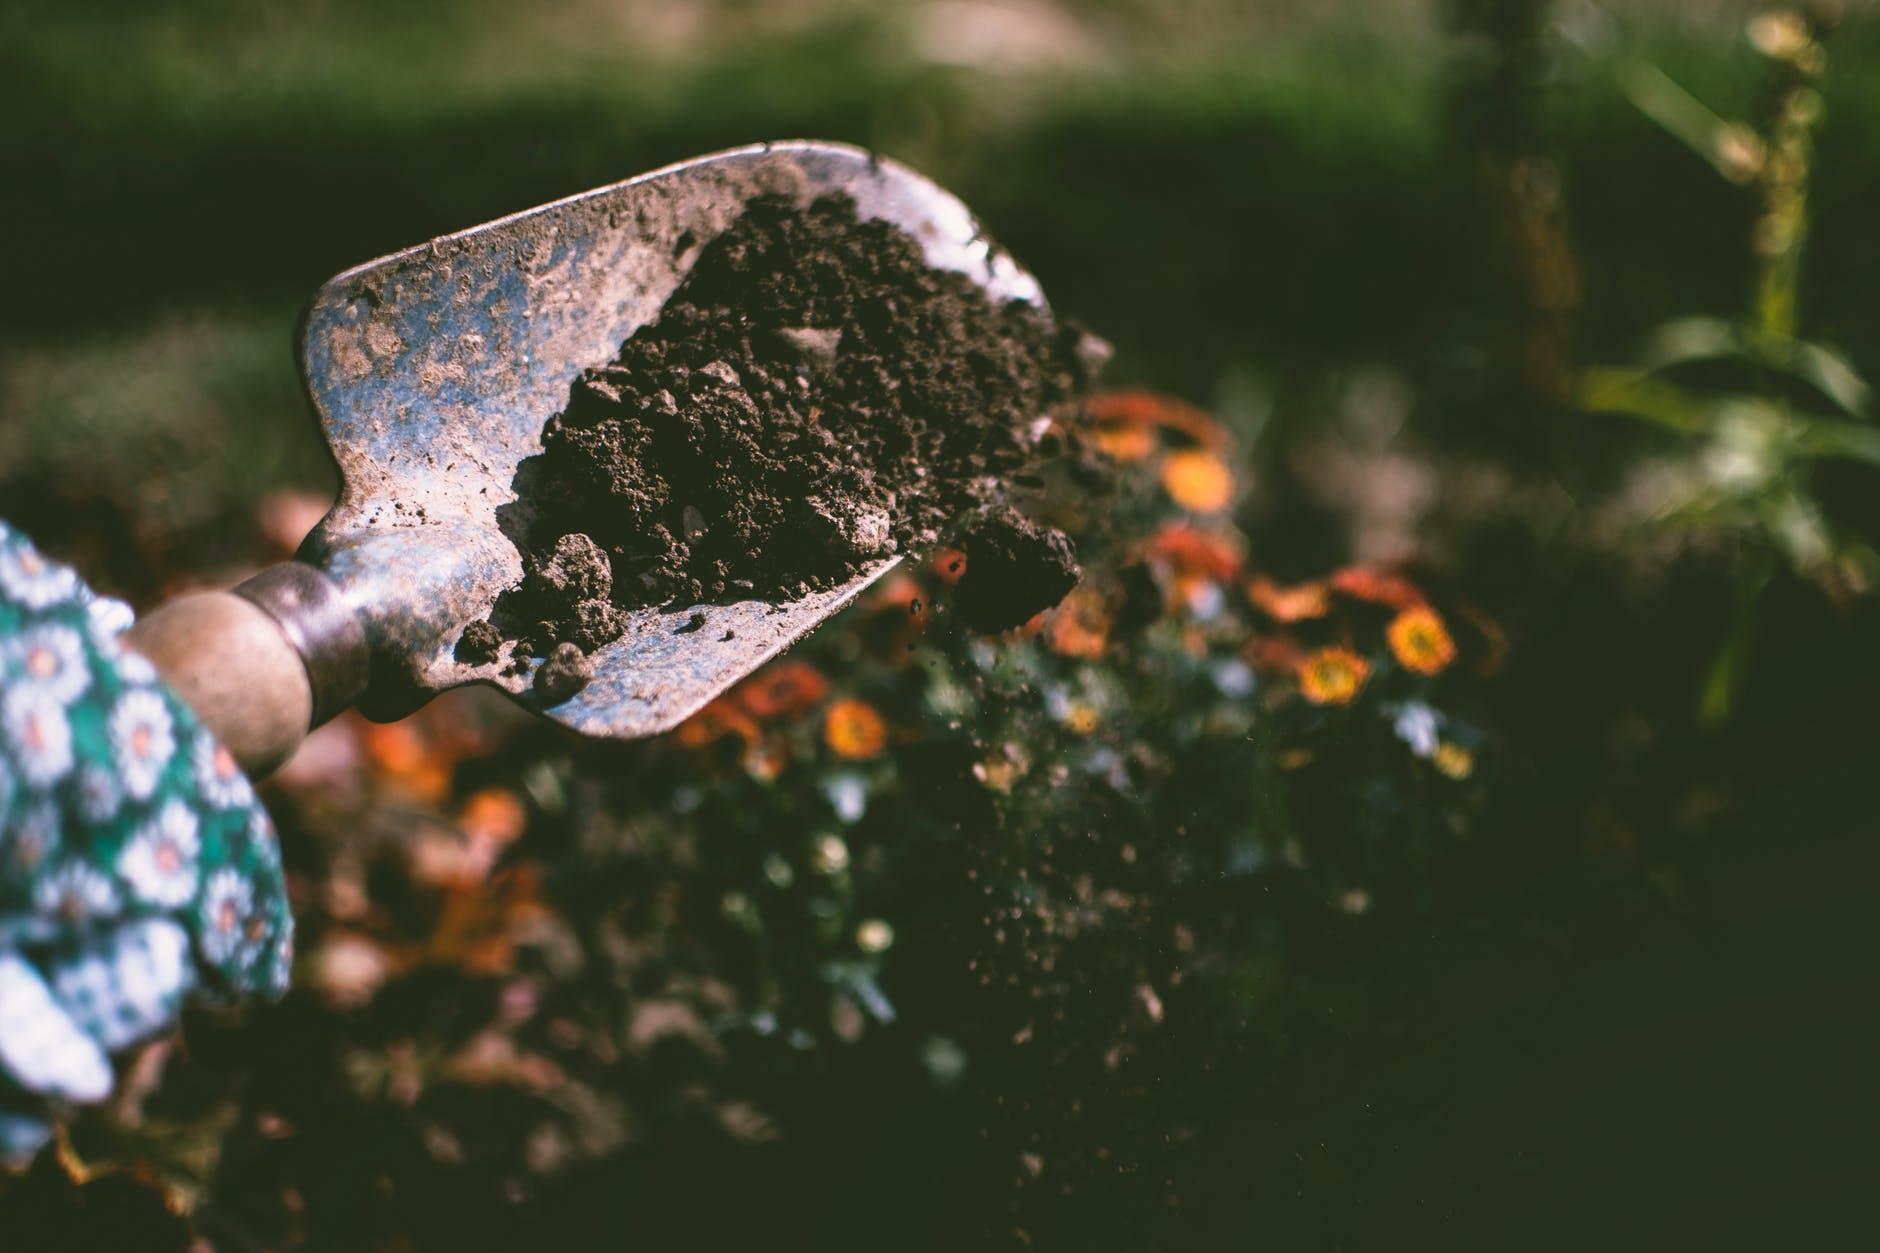 Top 8 tips to prepare your garden for Spring